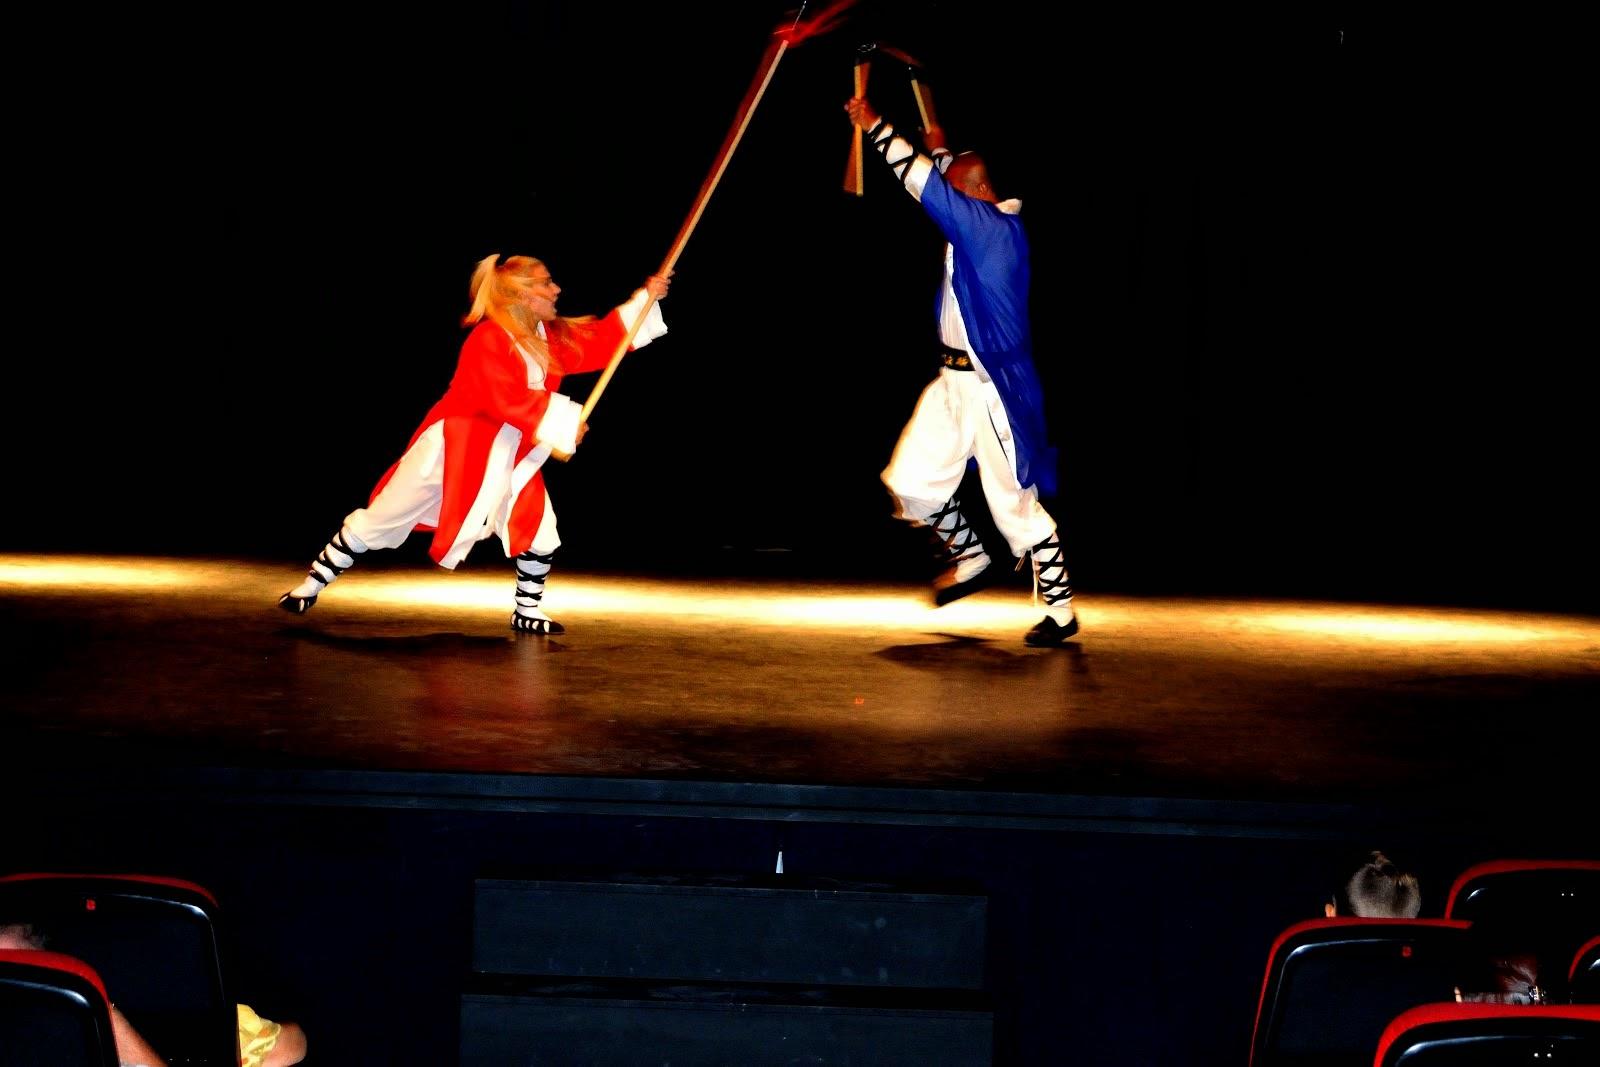 Paty Lee y GrandMaster Senna, Kung Fu Shaolin Tradicional y Wudangshan - Clases y Cursos.